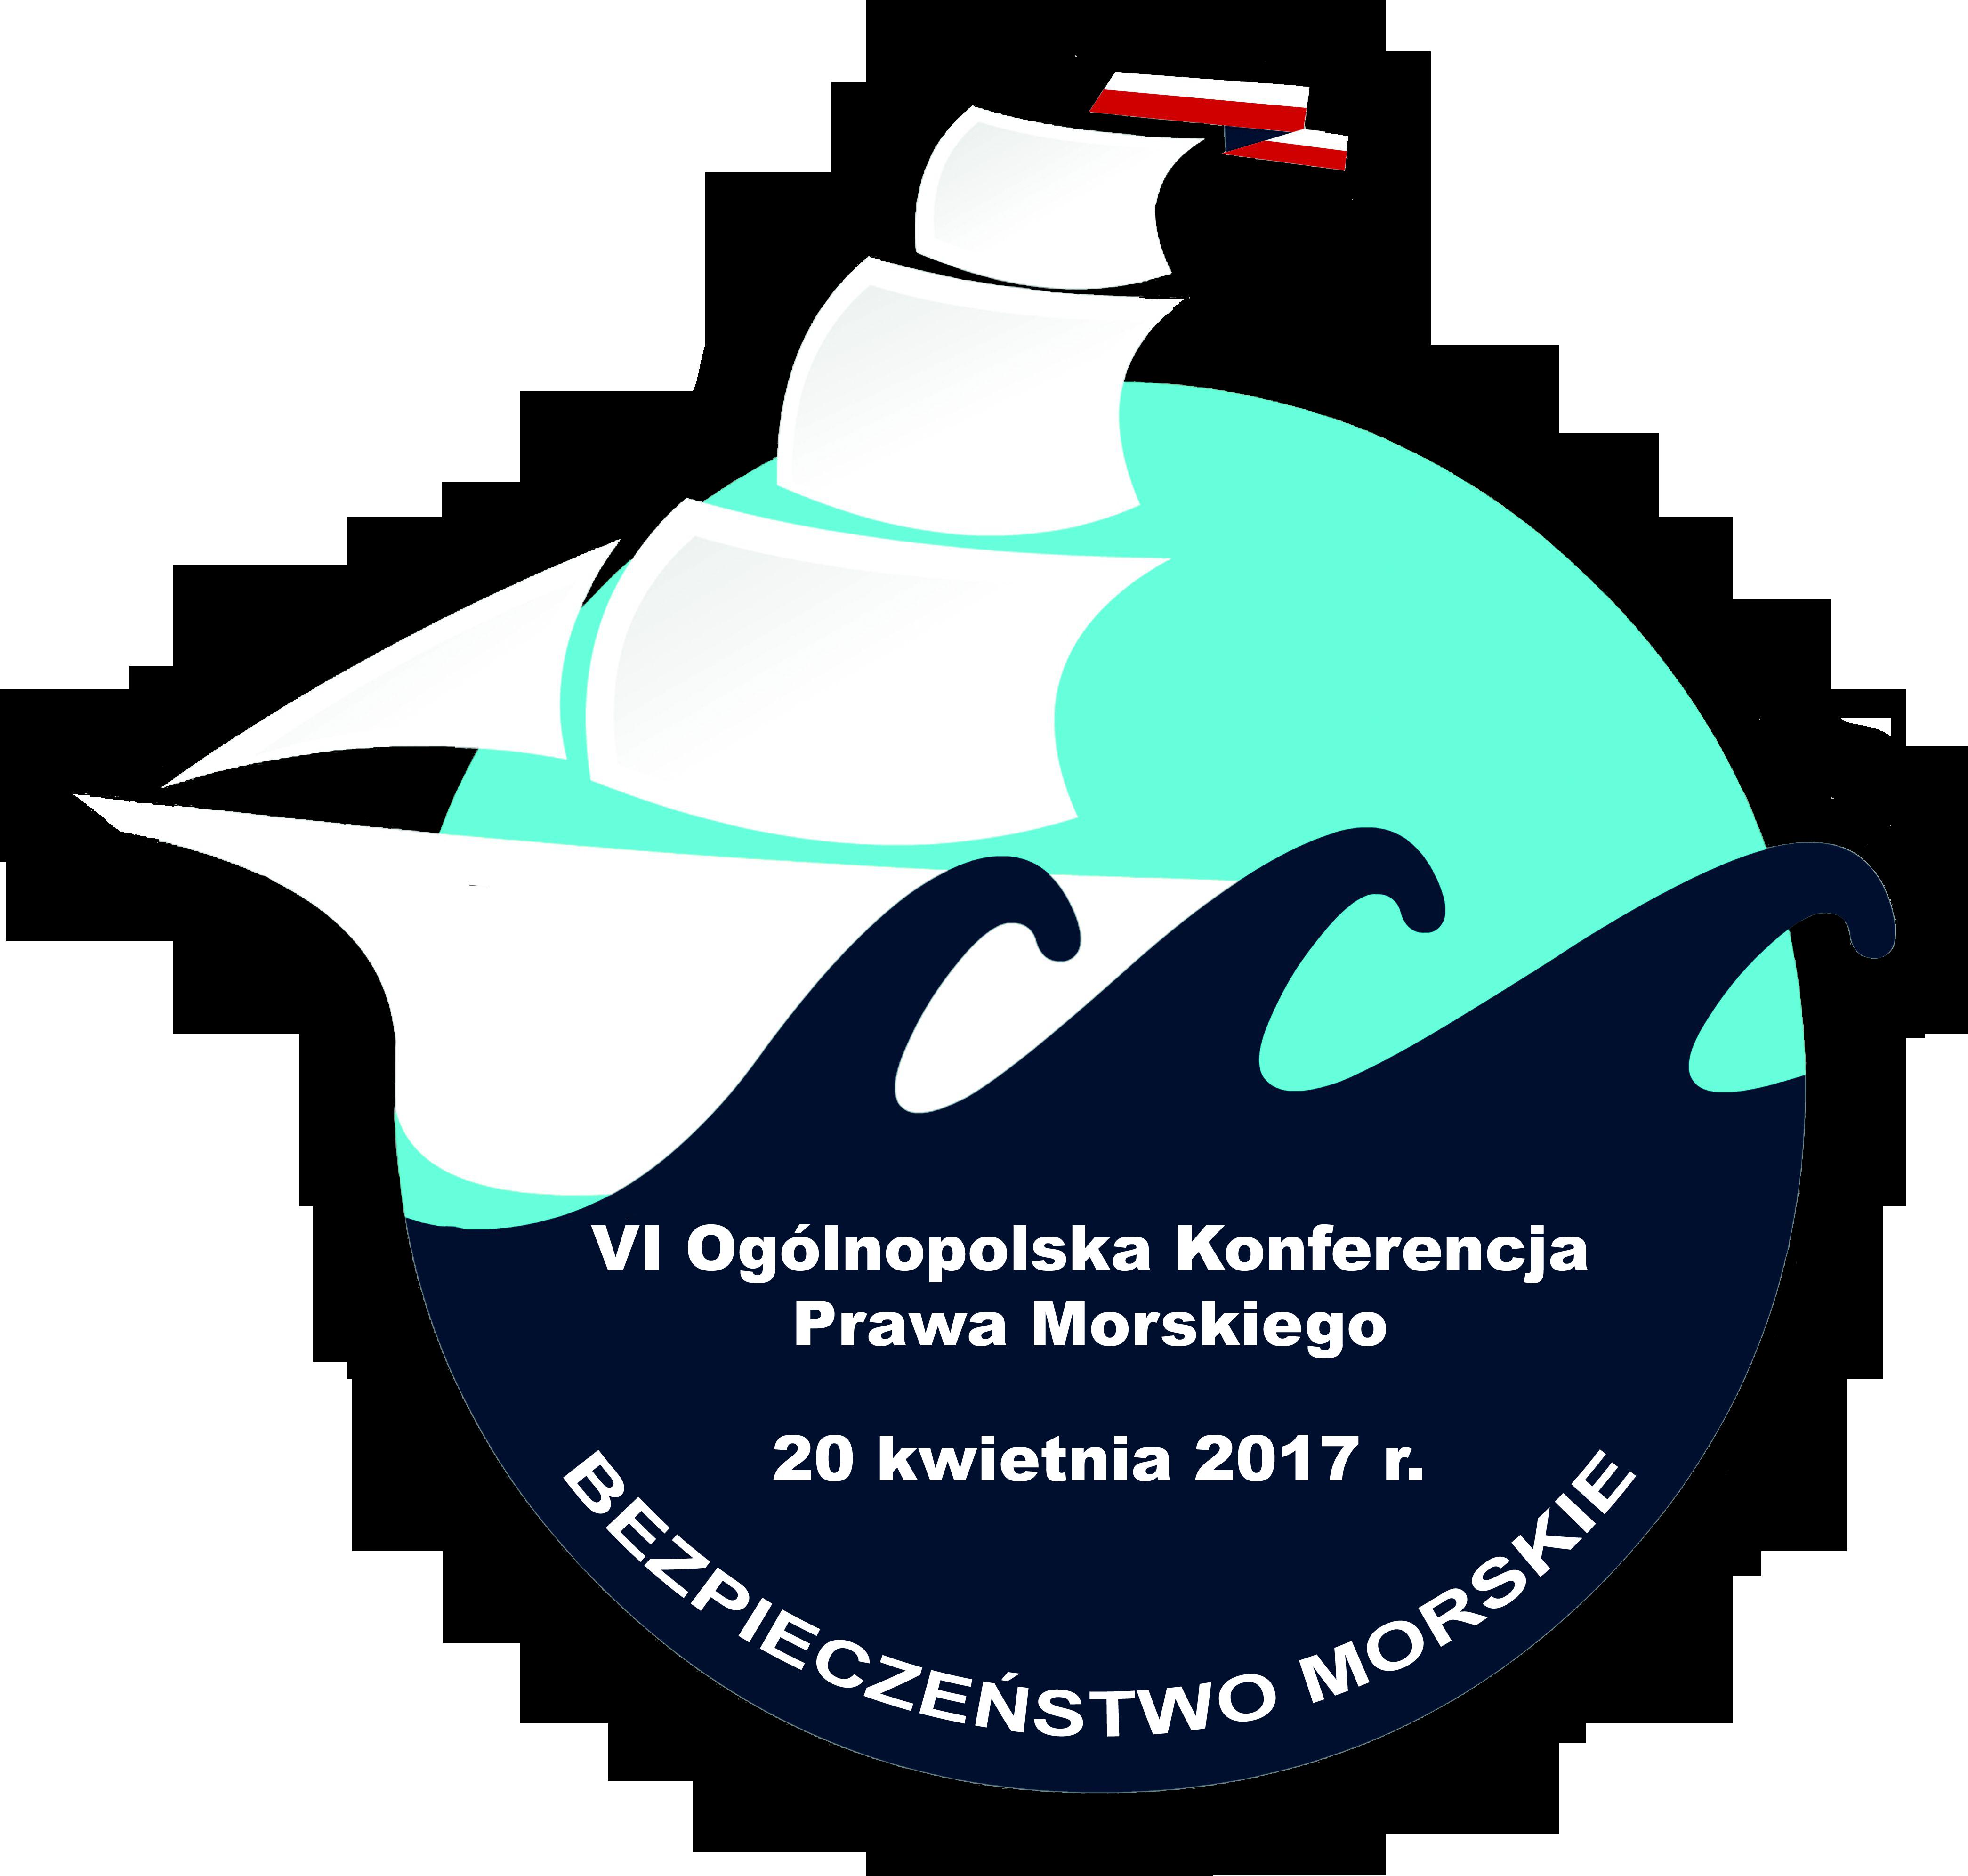 VI Ogólnopolska Konferencja Prawa Morskiego